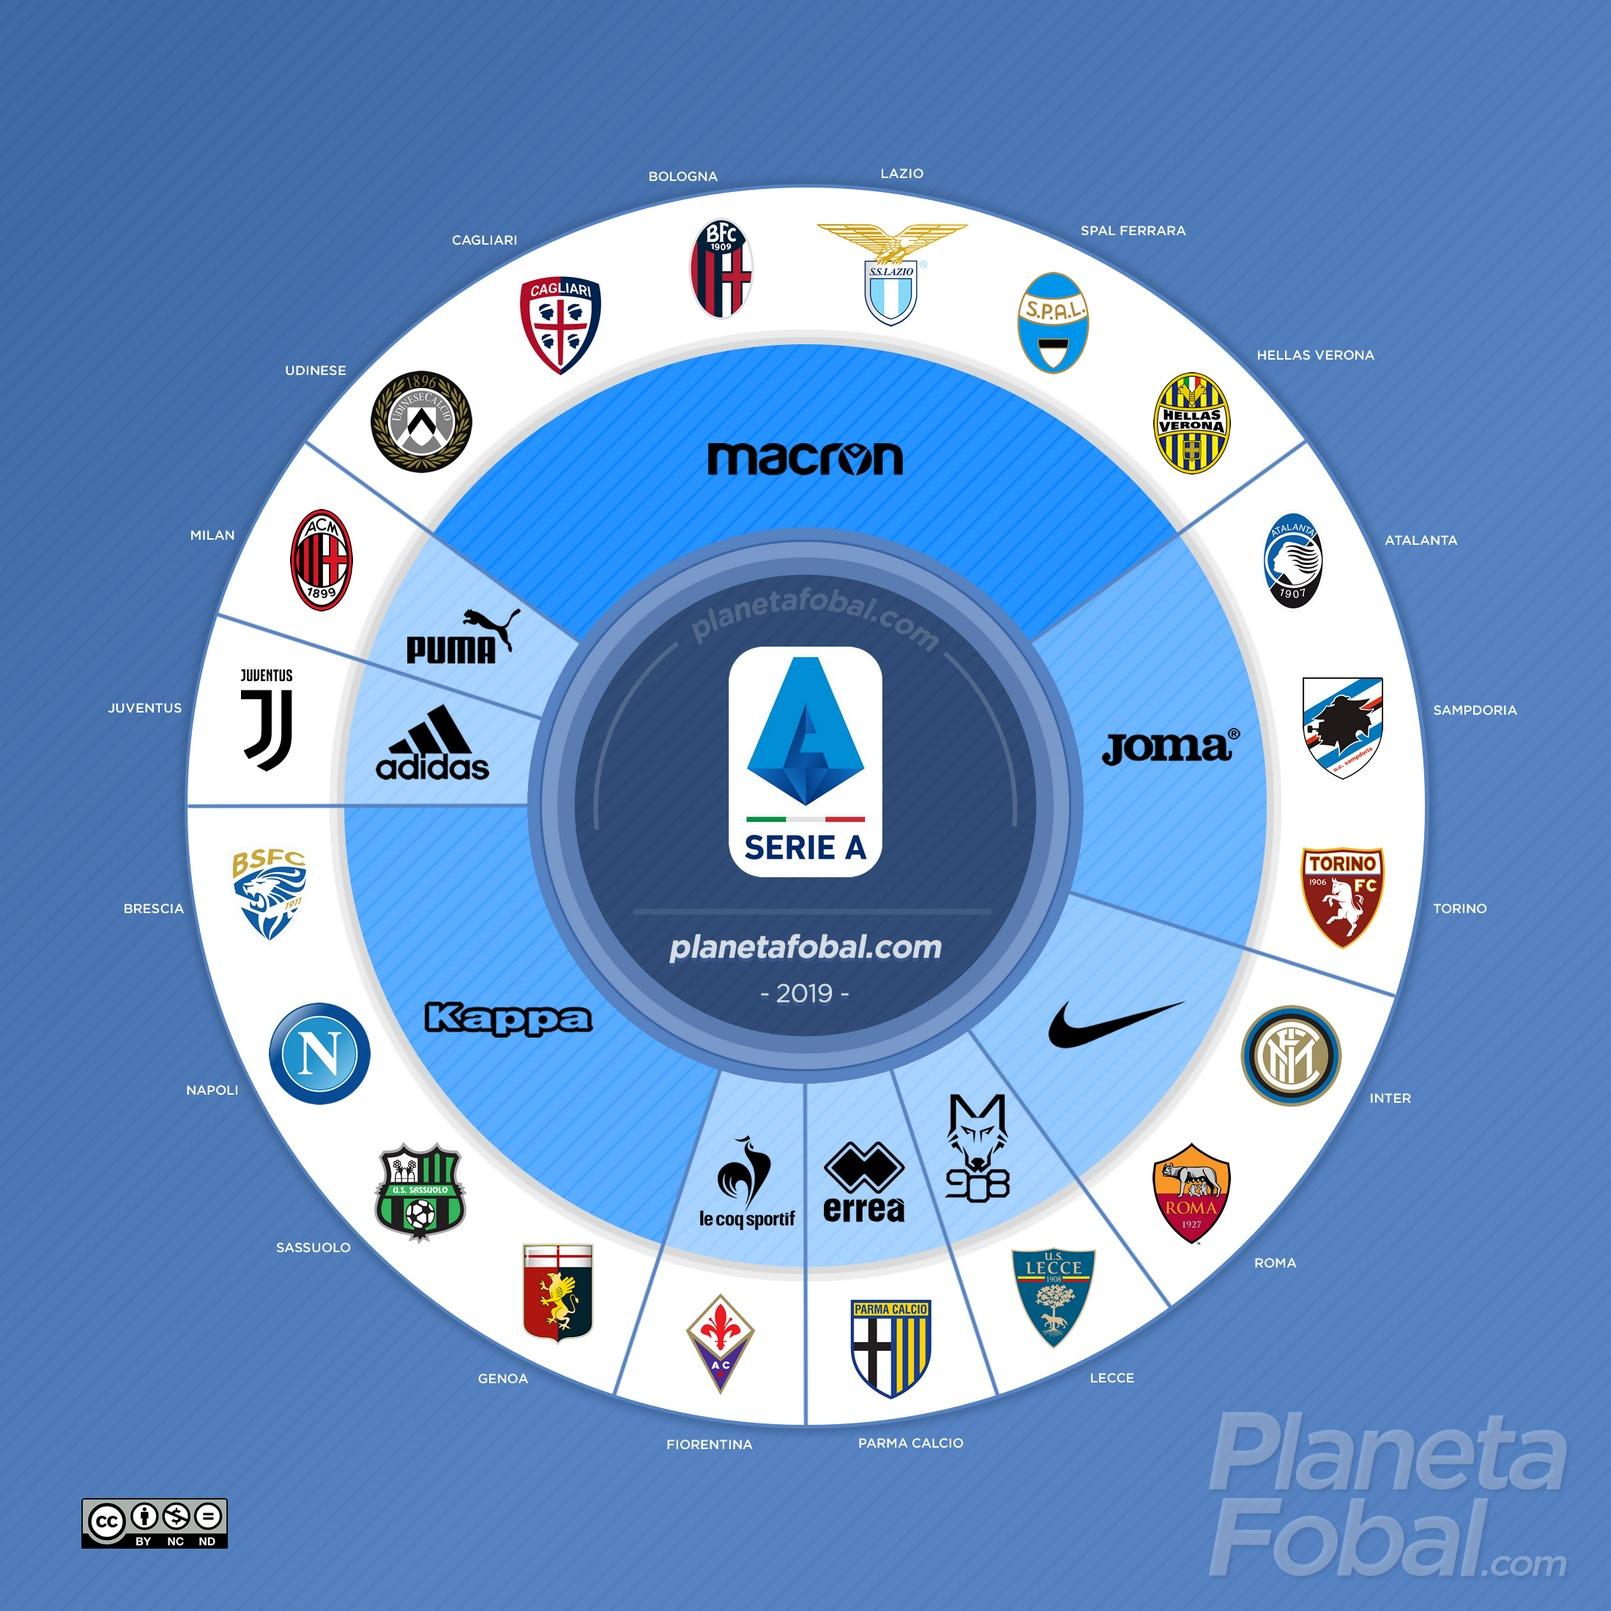 Marcas deportivas de la Serie A de Italia 2019/2020 | @planetafobal